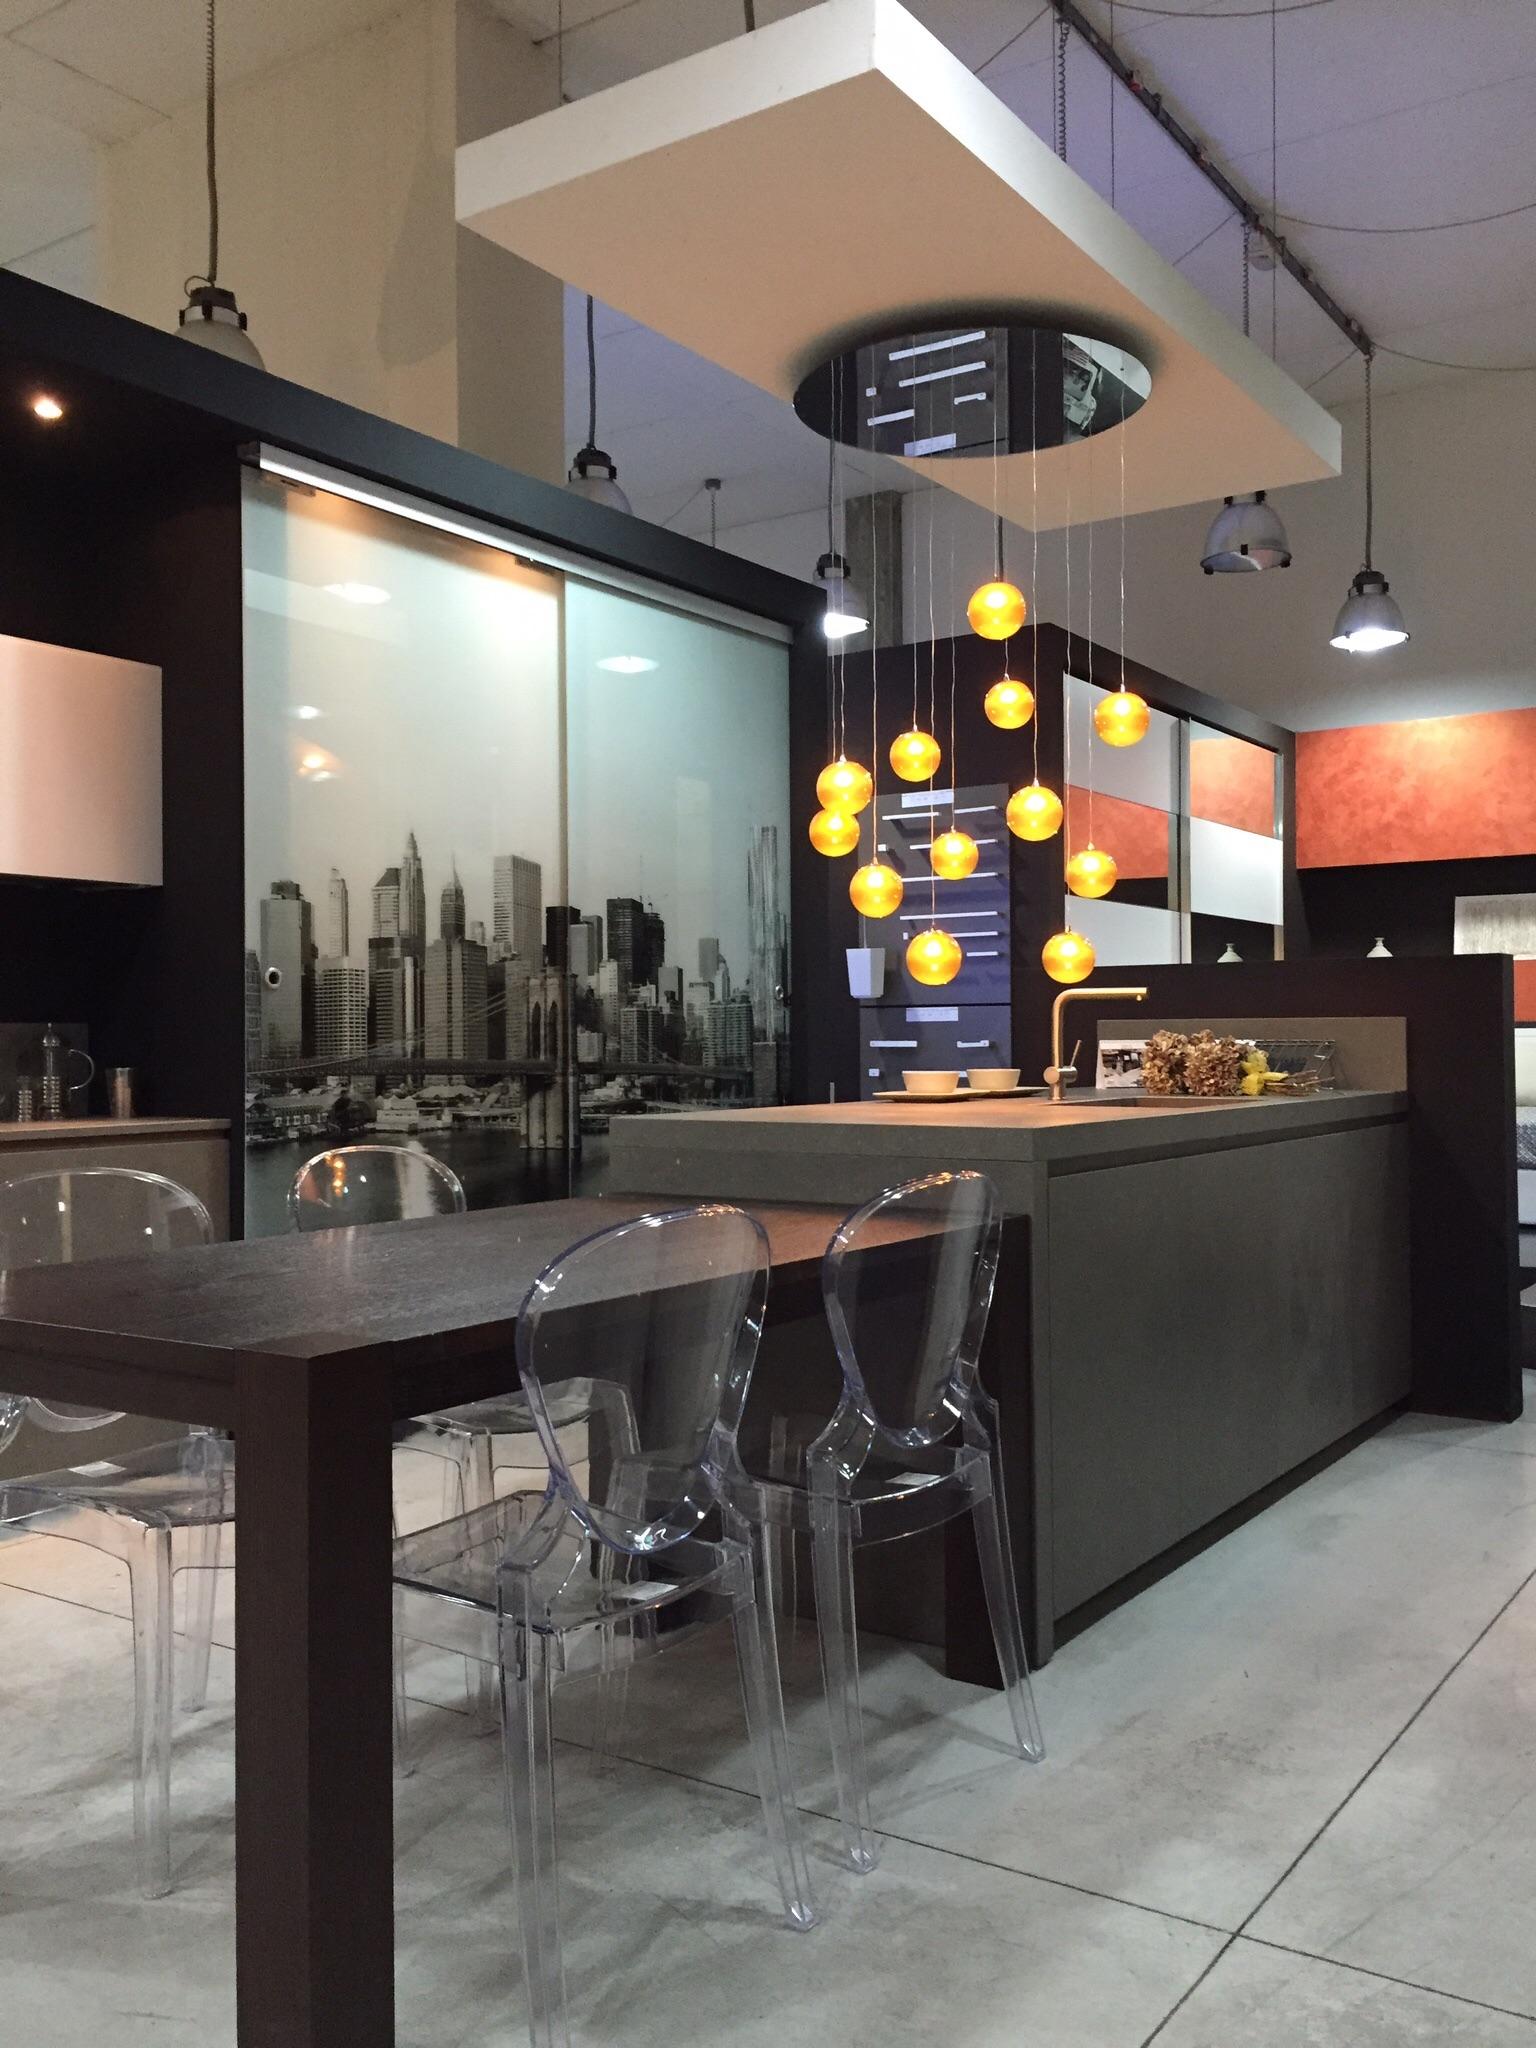 Modulnova Cucina Twenty Kerlite Gres   Vetro Scontato Del  60 %  #8D573E 1536 2048 Modelli Tende Sala Da Pranzo